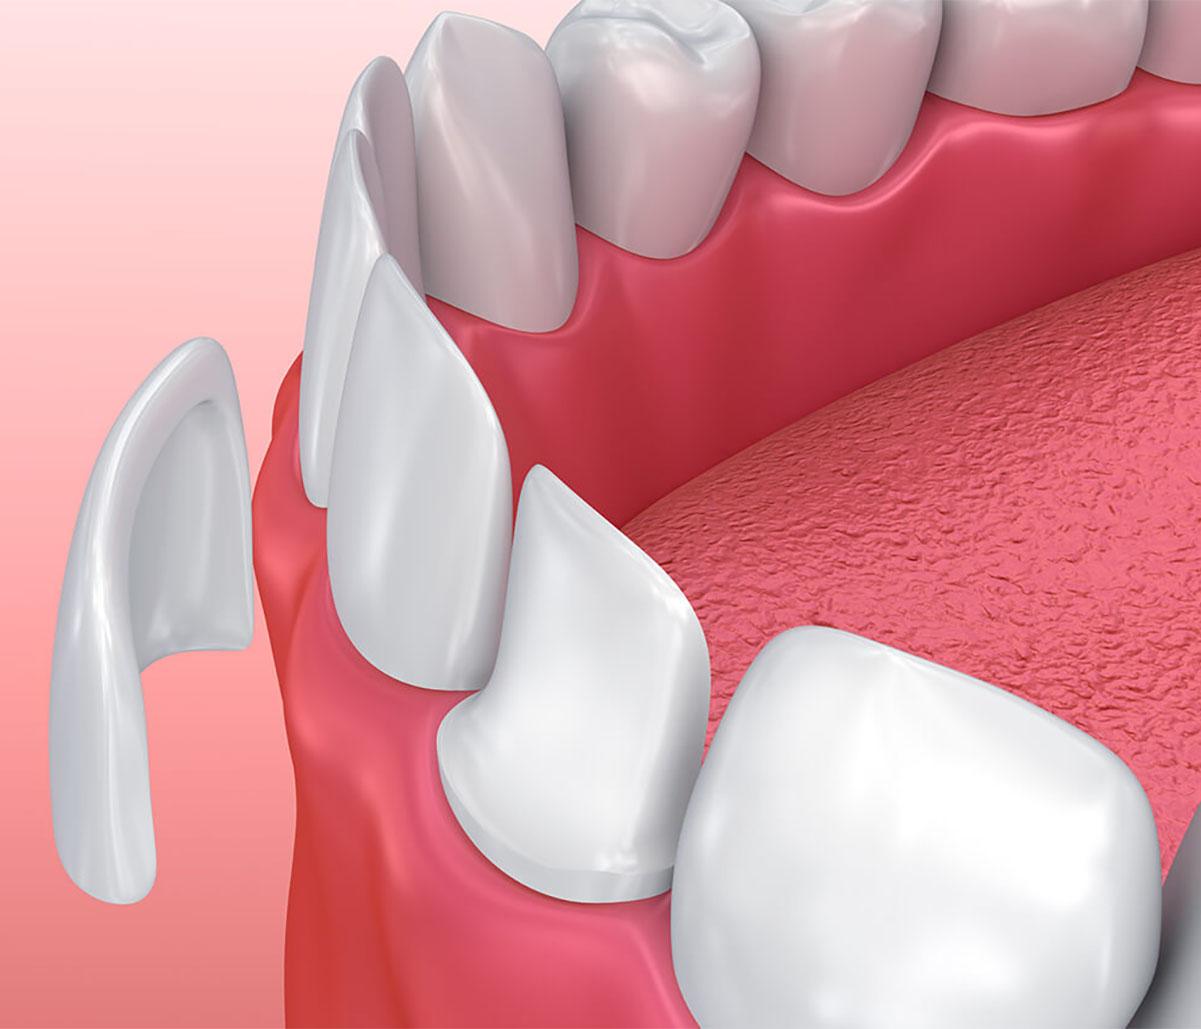 Teeth Veneer Treatment in Milton Area